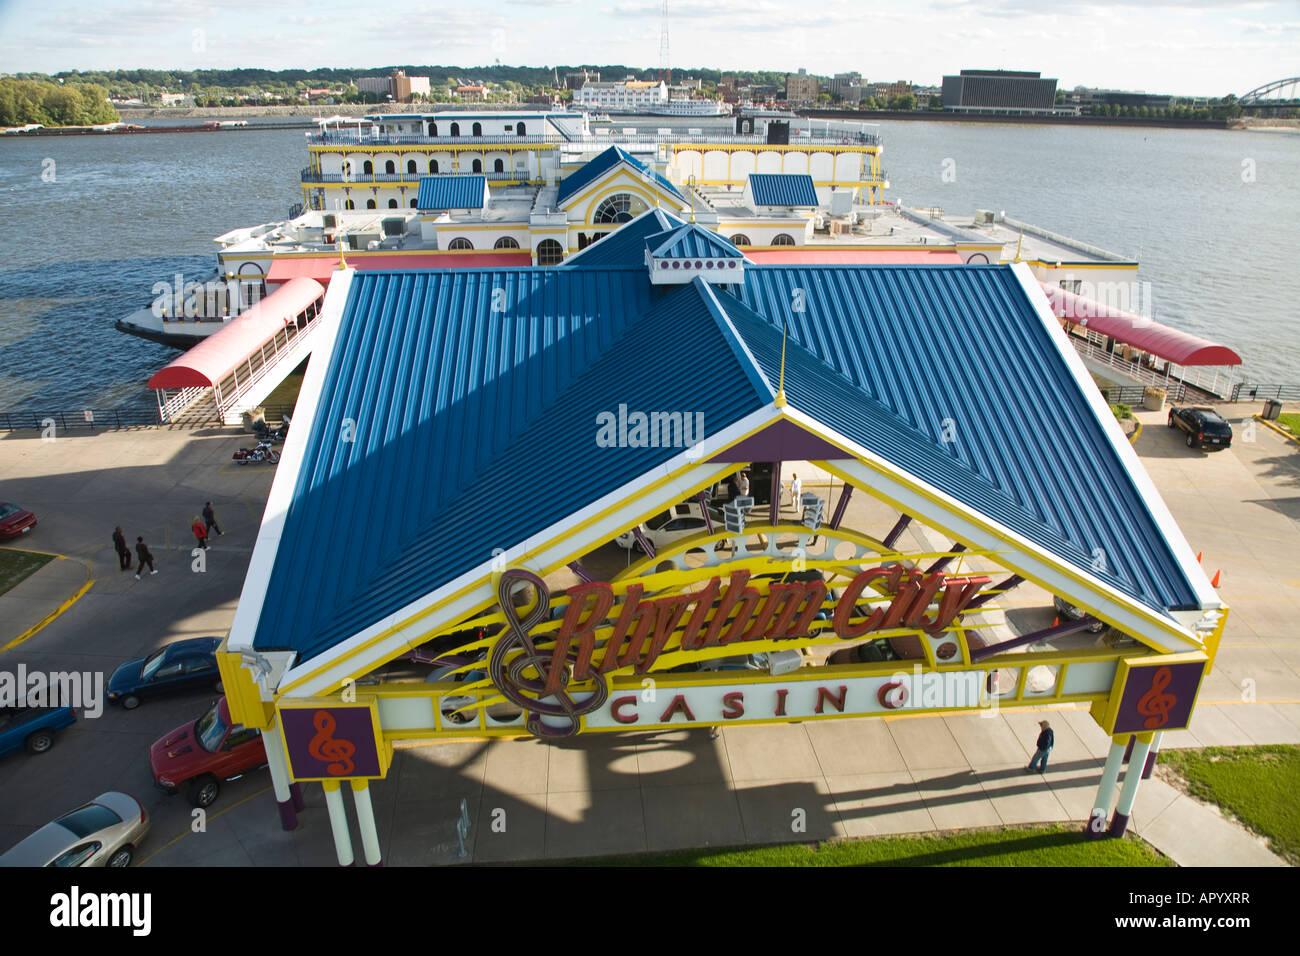 Davenport gambling free money to play at the casino